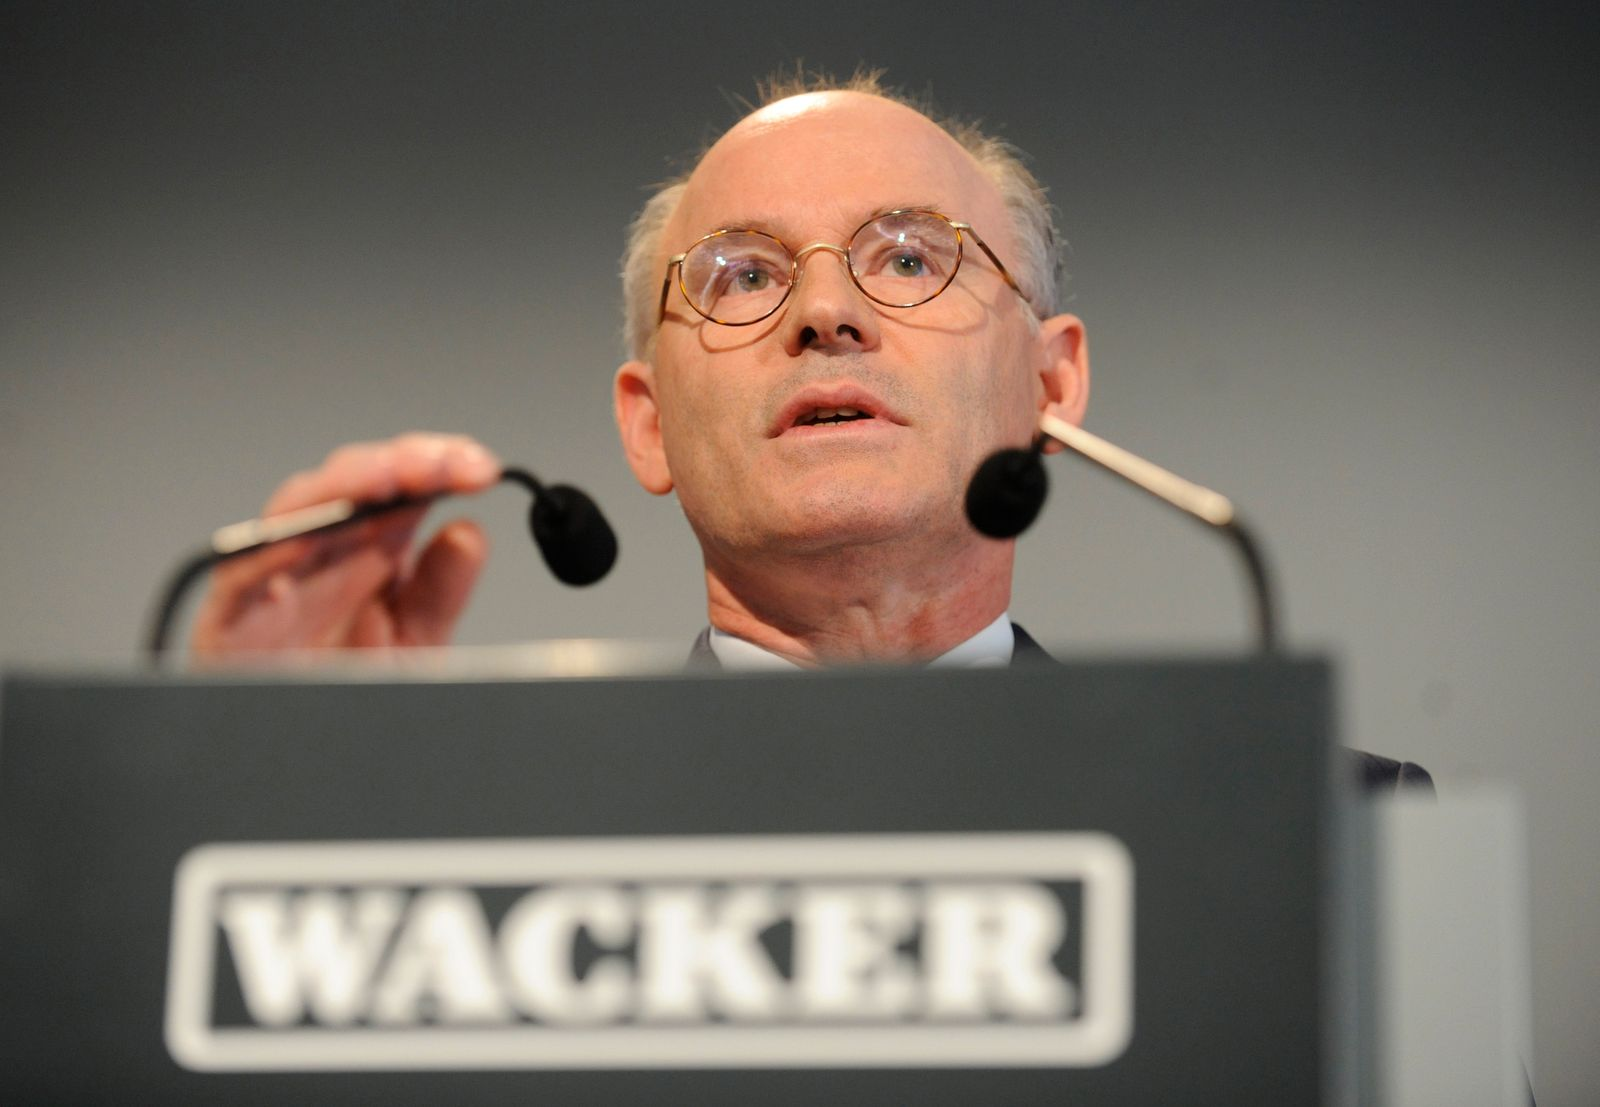 Wacker Chemie / Rudolf Staudigl